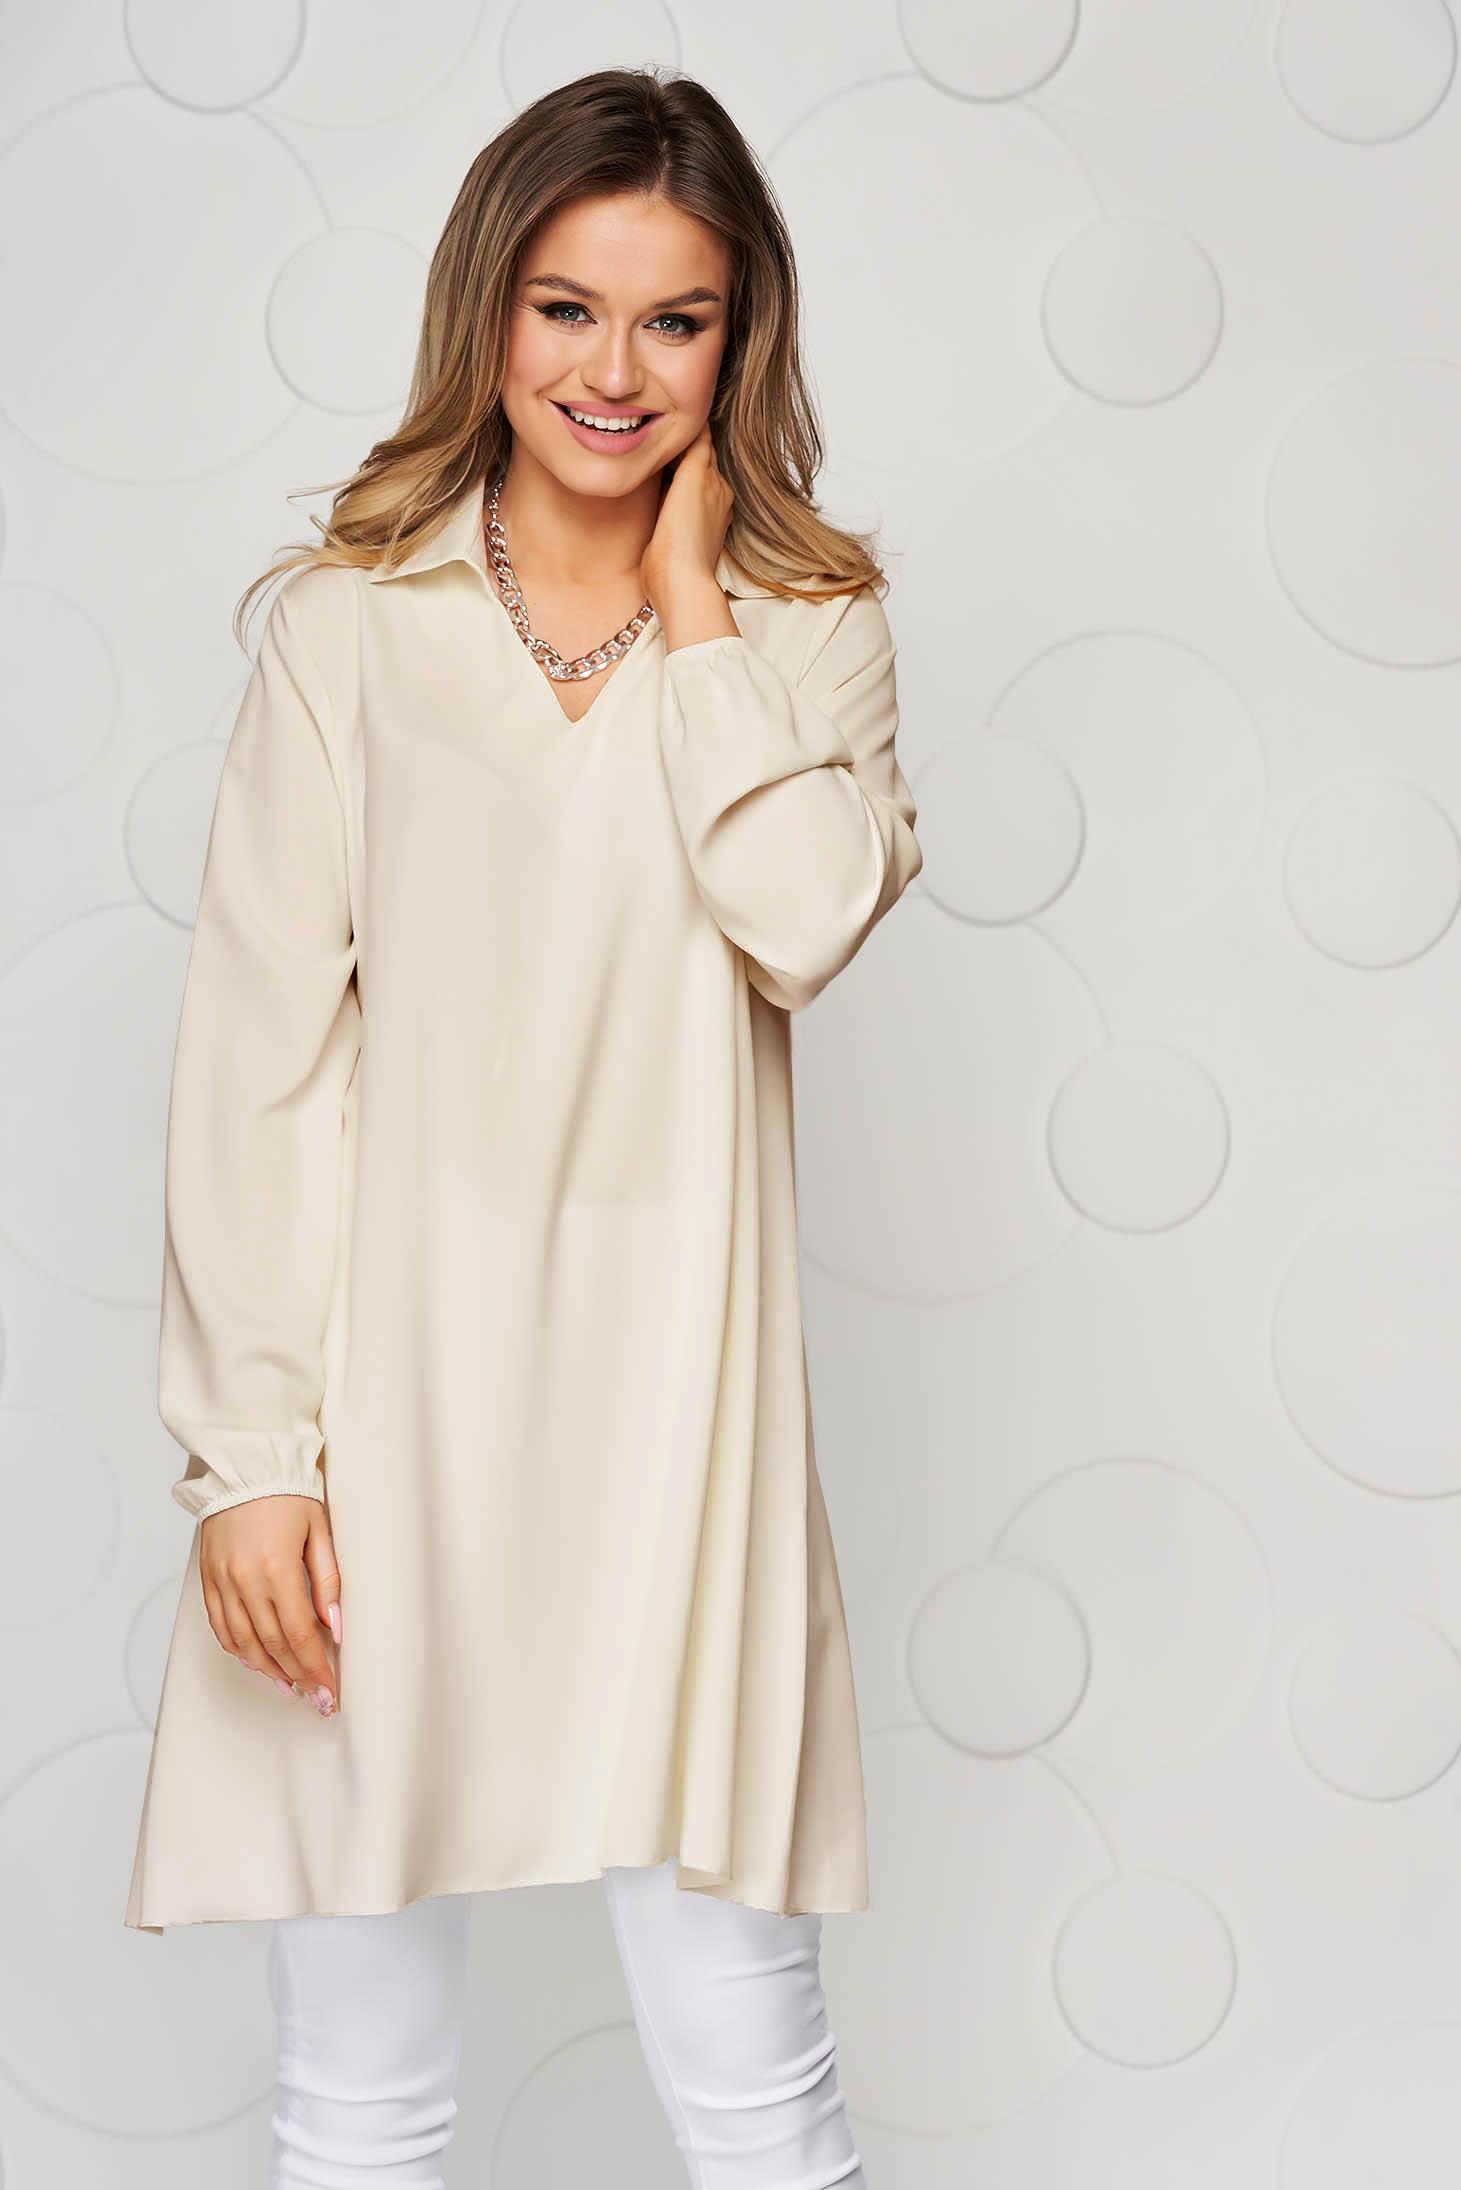 Bluza dama SunShine crem cu croi larg din material vaporos si transparent cu maneca lunga